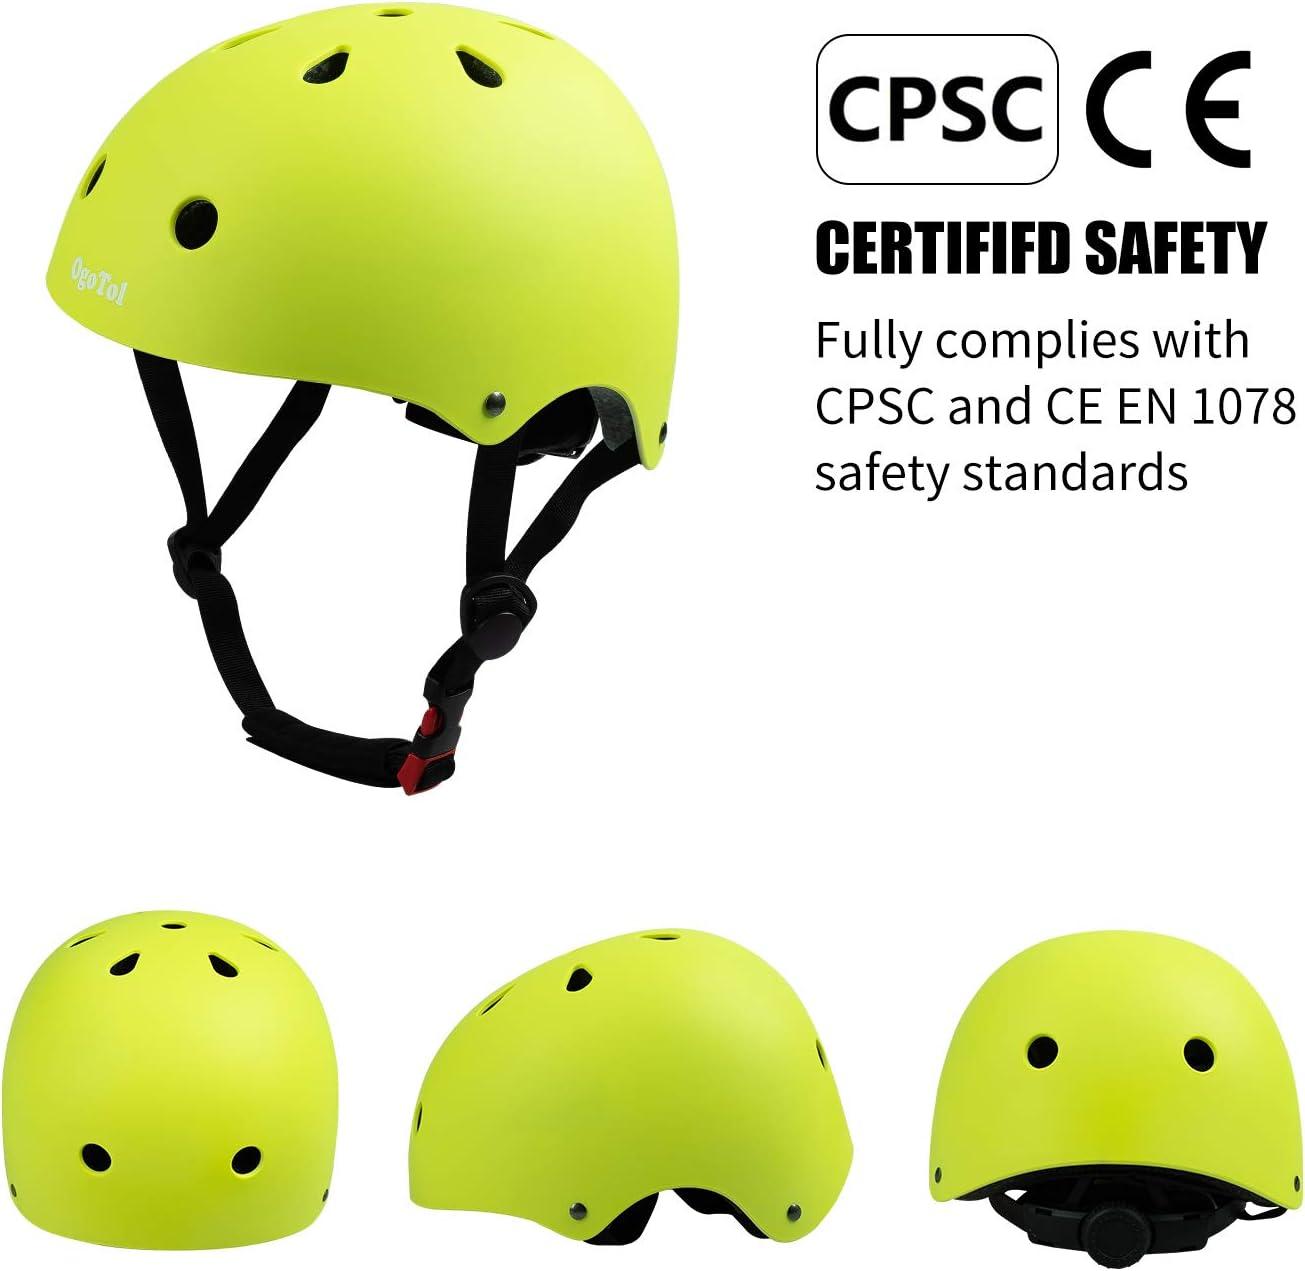 Purpol Kids Bike Helmet Toddler Helmet 3-8 Years Sport Protective Gear Set Boy Girl Adjustable Child Cycling Helmet with Knee Pads Elbow Pads Wrist Guards Skateboard Helmet CPSC Certified